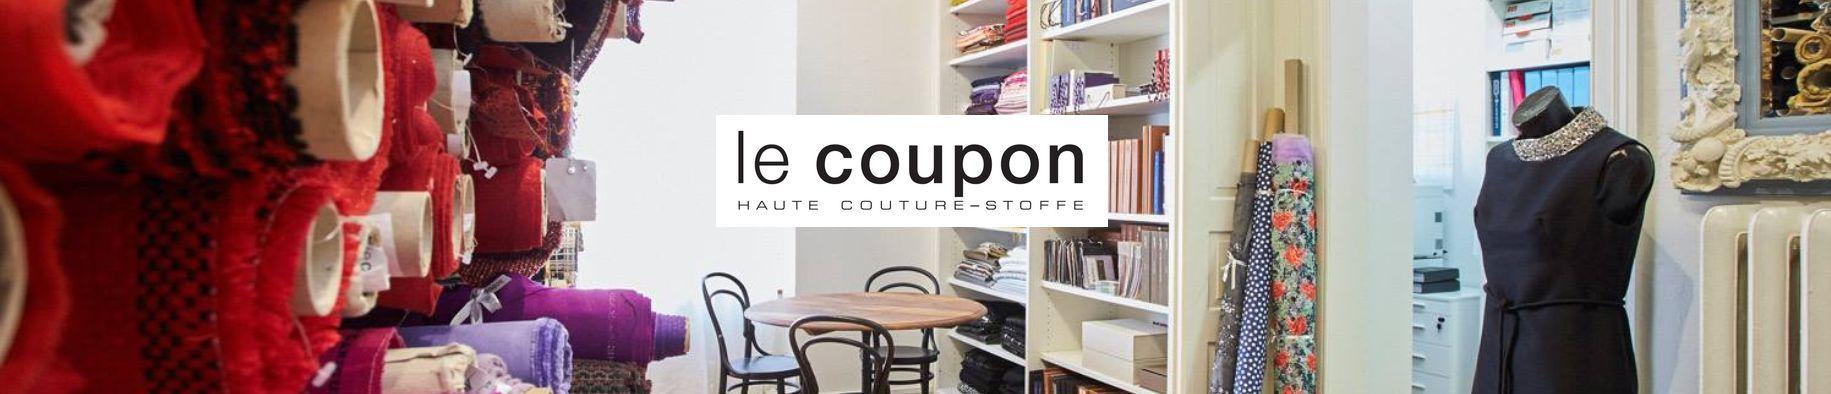 Le Coupon GmbH